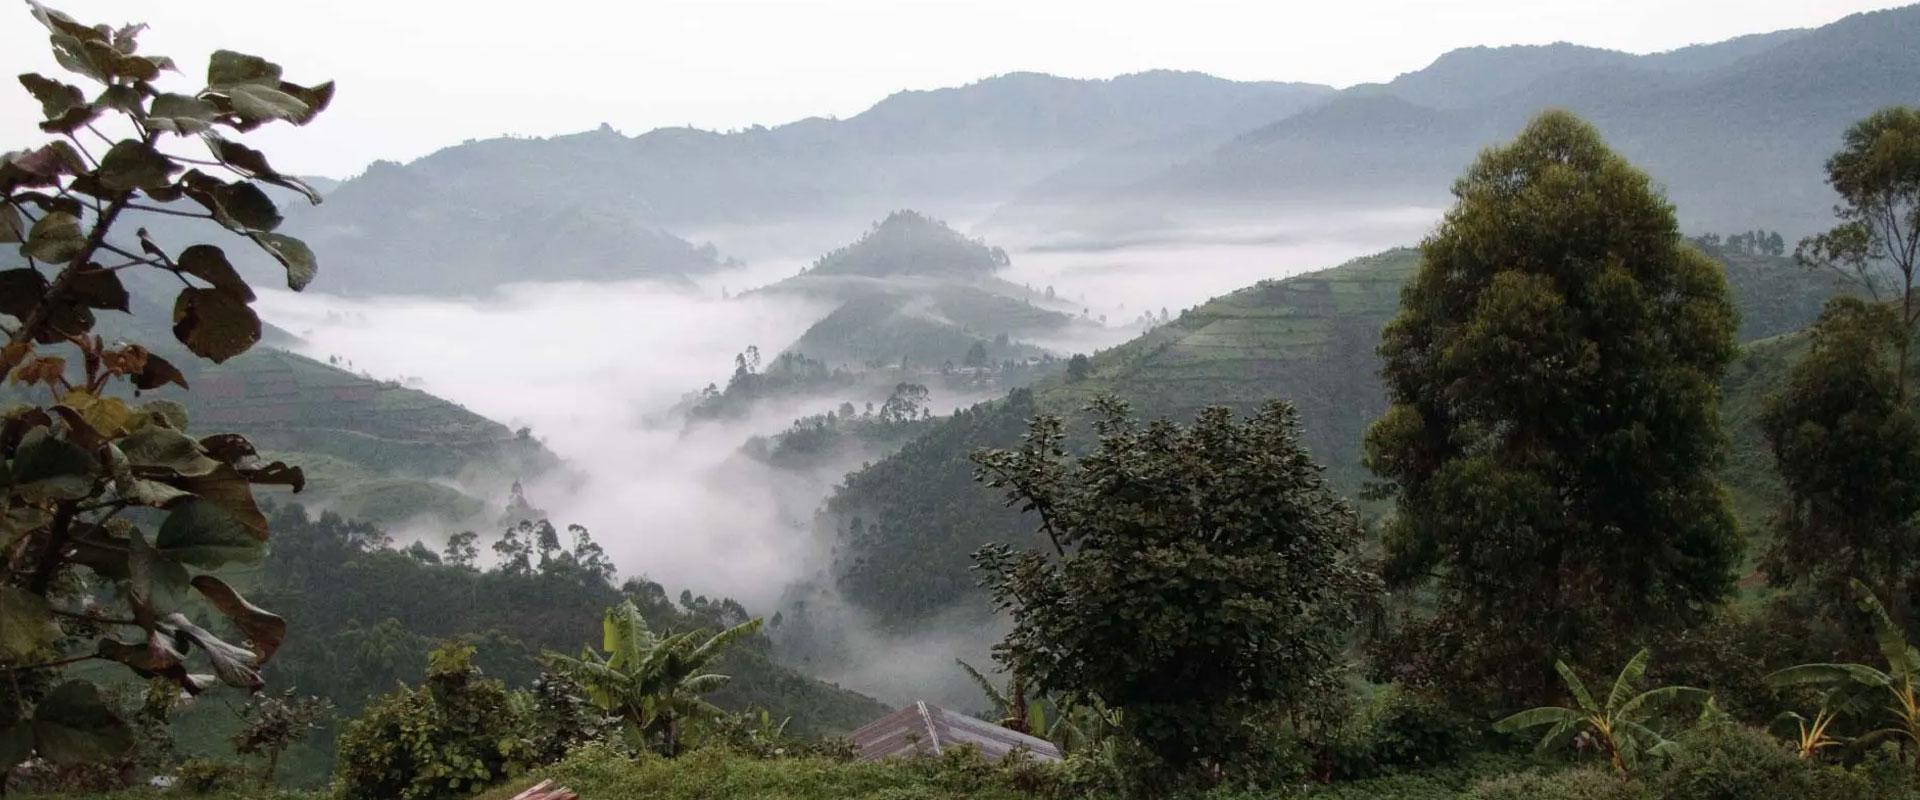 Best-Time-To-Visit-Uganda